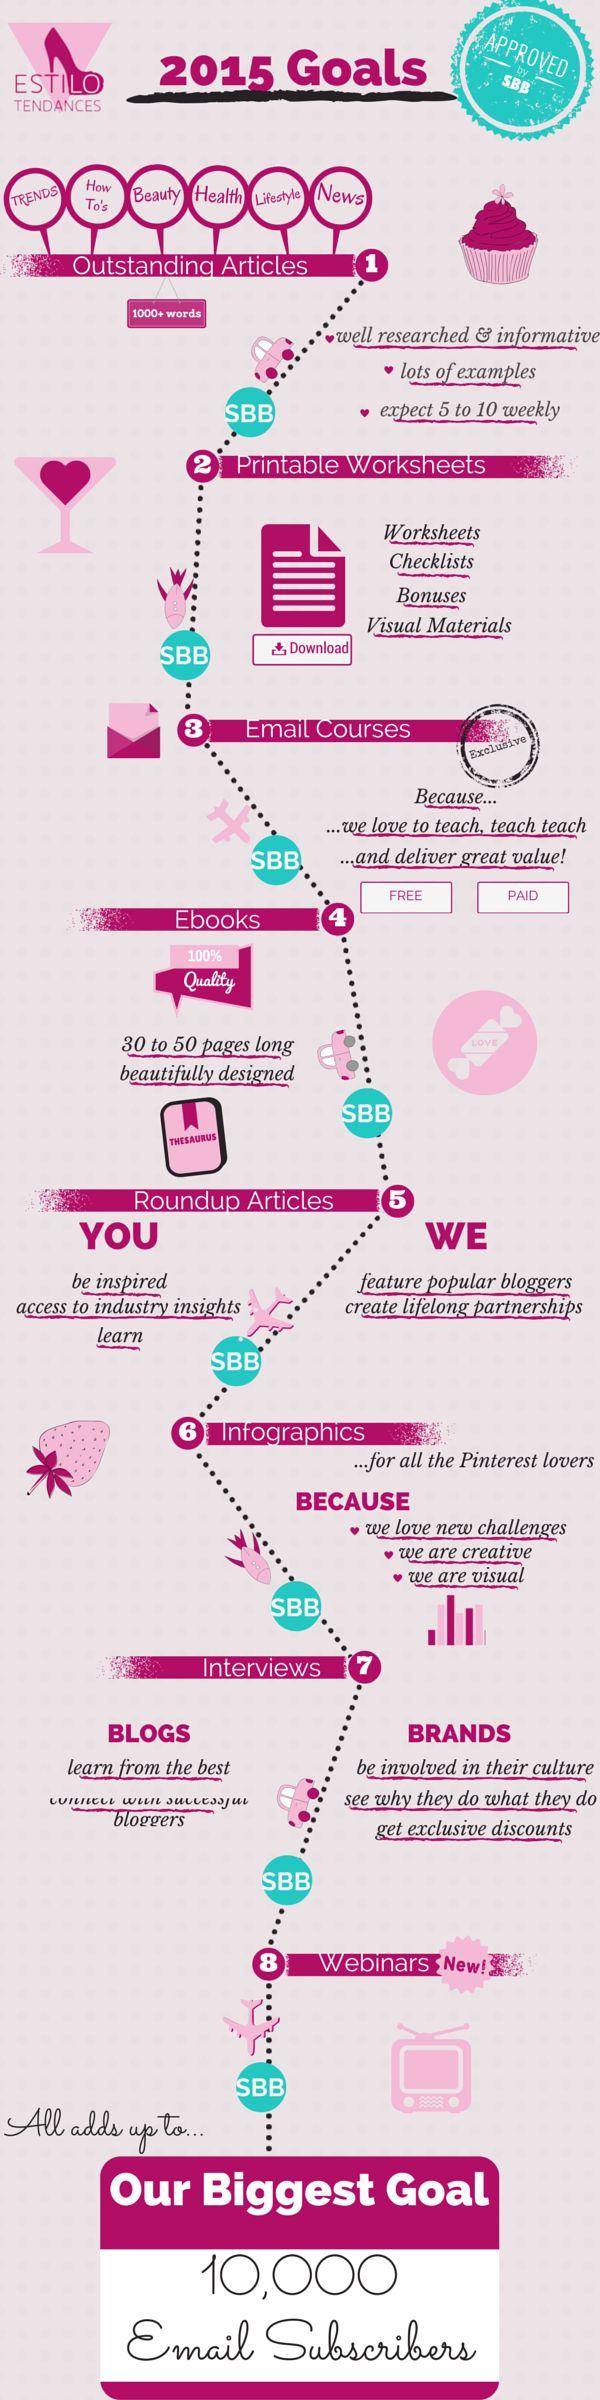 Estilo Tendances' Dreams and Goals for 2015!  Our own Infographic! #secretbloggersbusiness #sbbscholarship